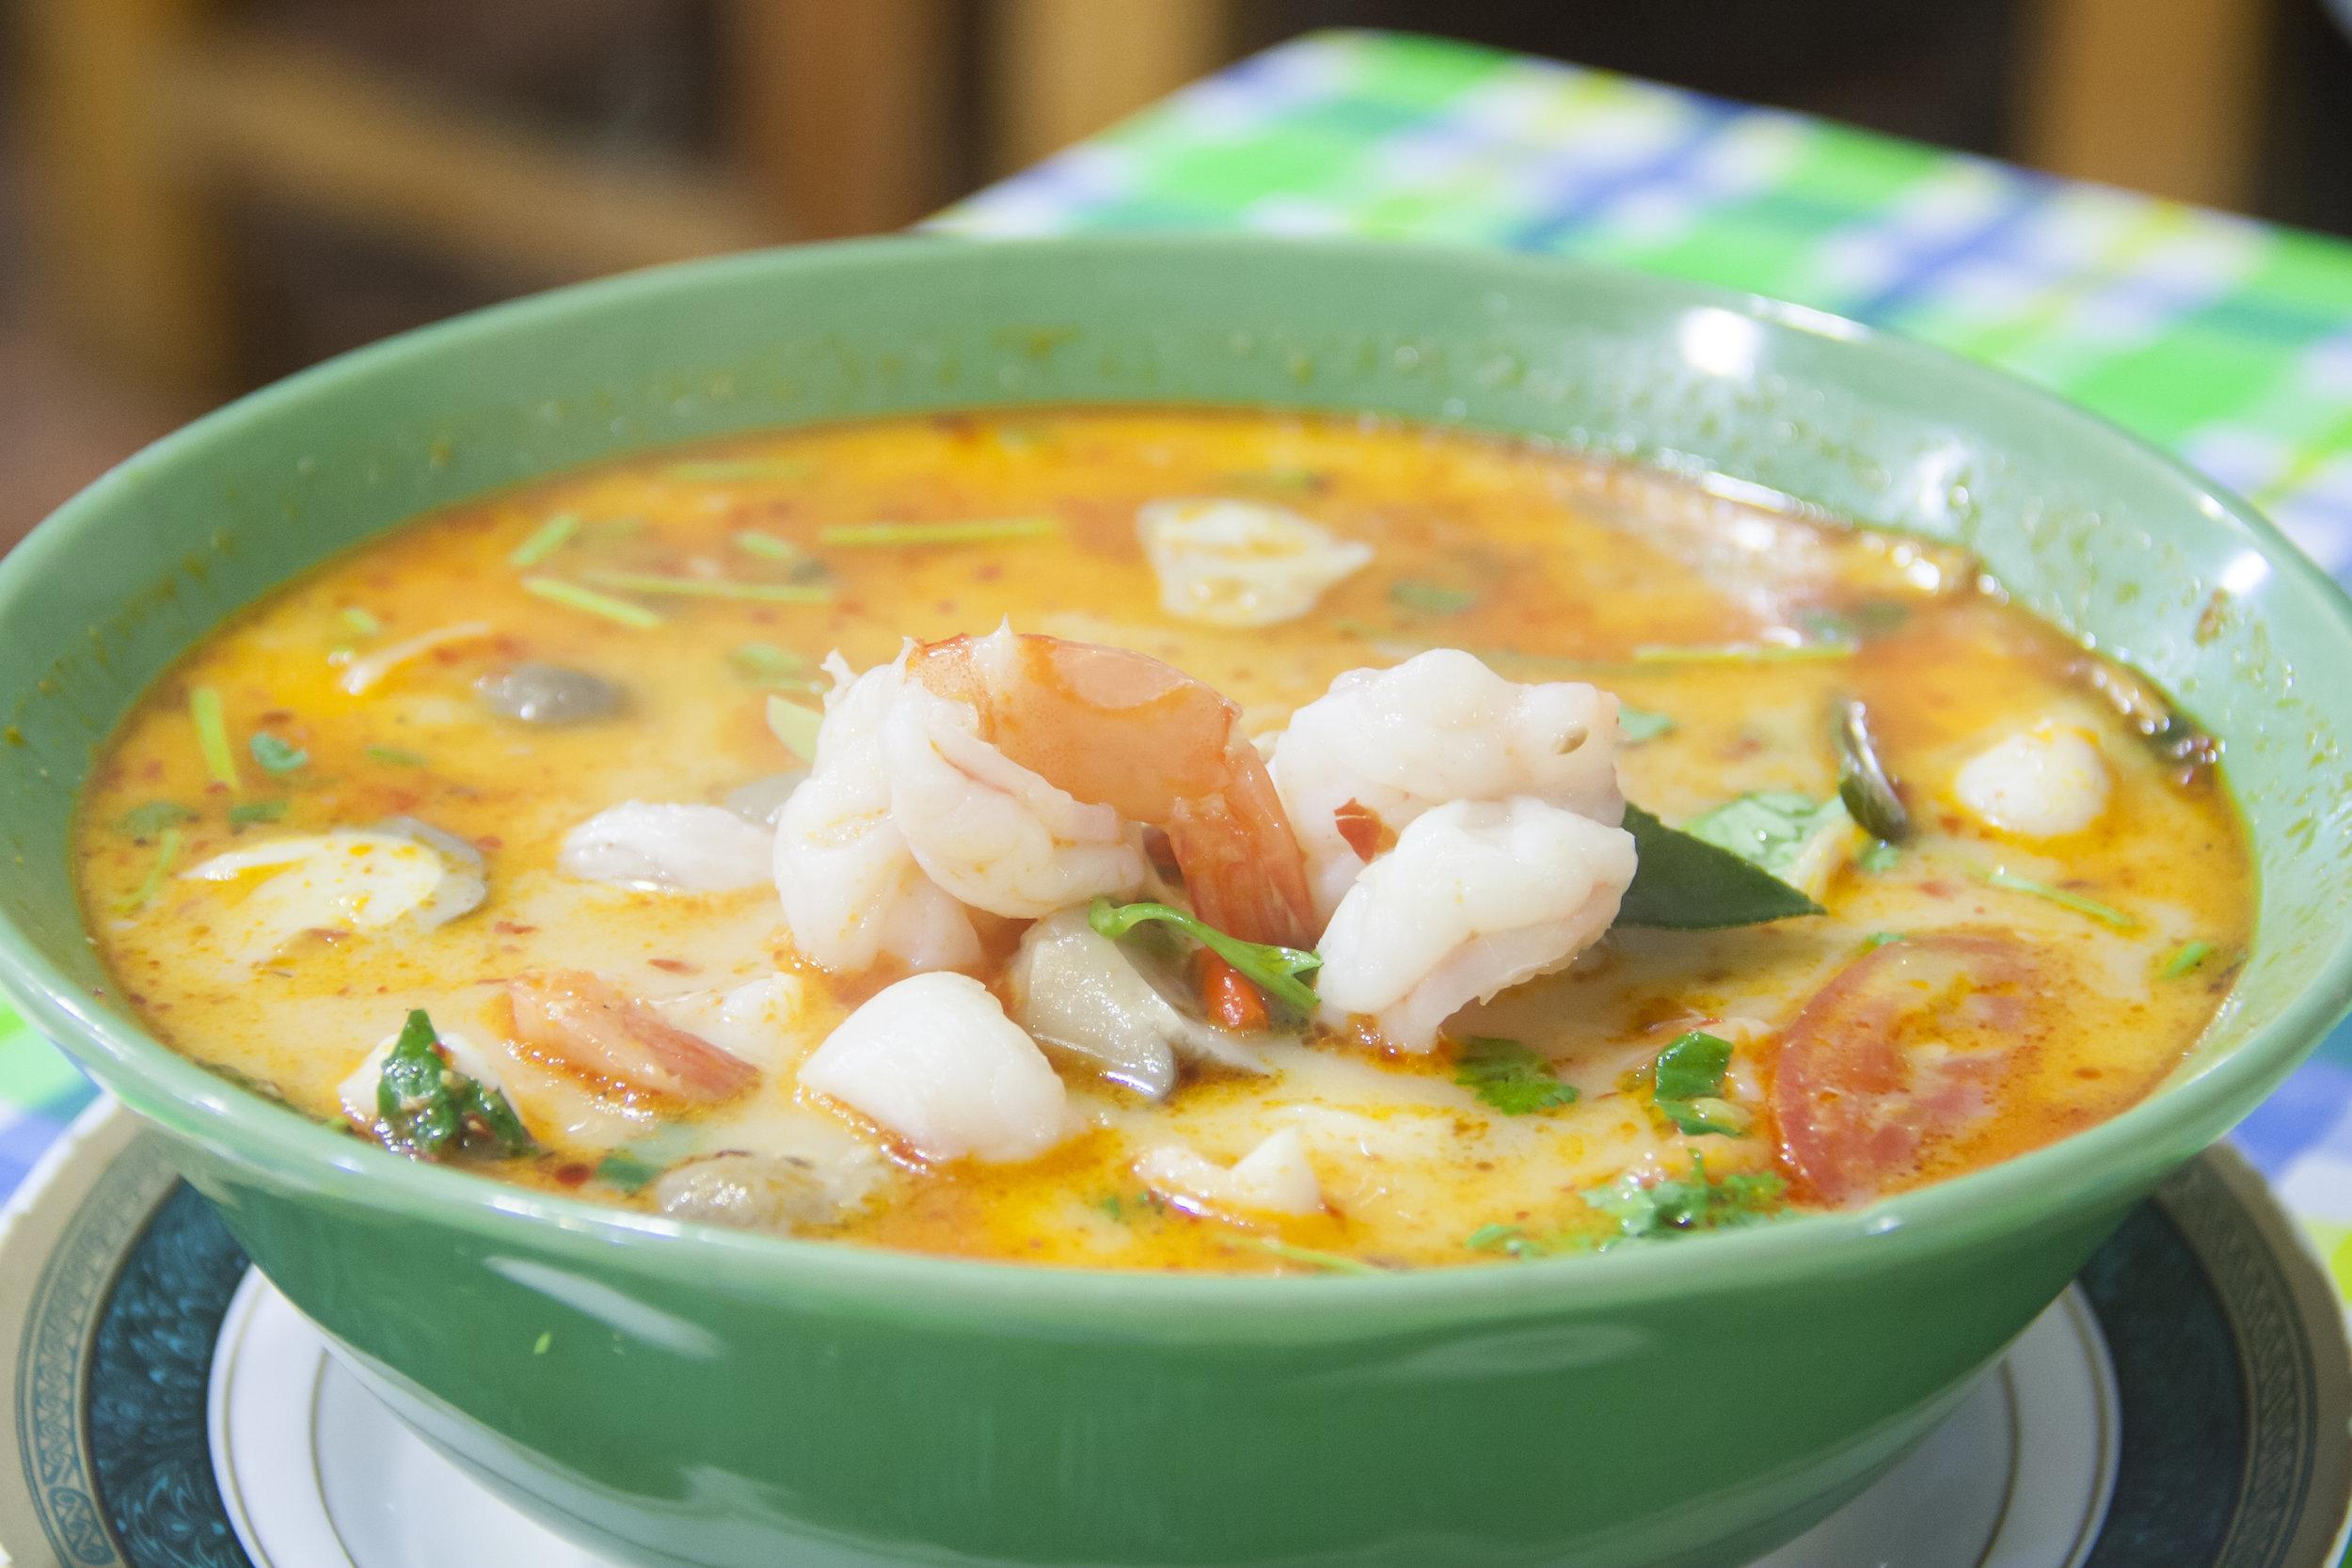 Online Personal Trainer Main Meal Recipes -Garlic Prawns & Cod.jpg